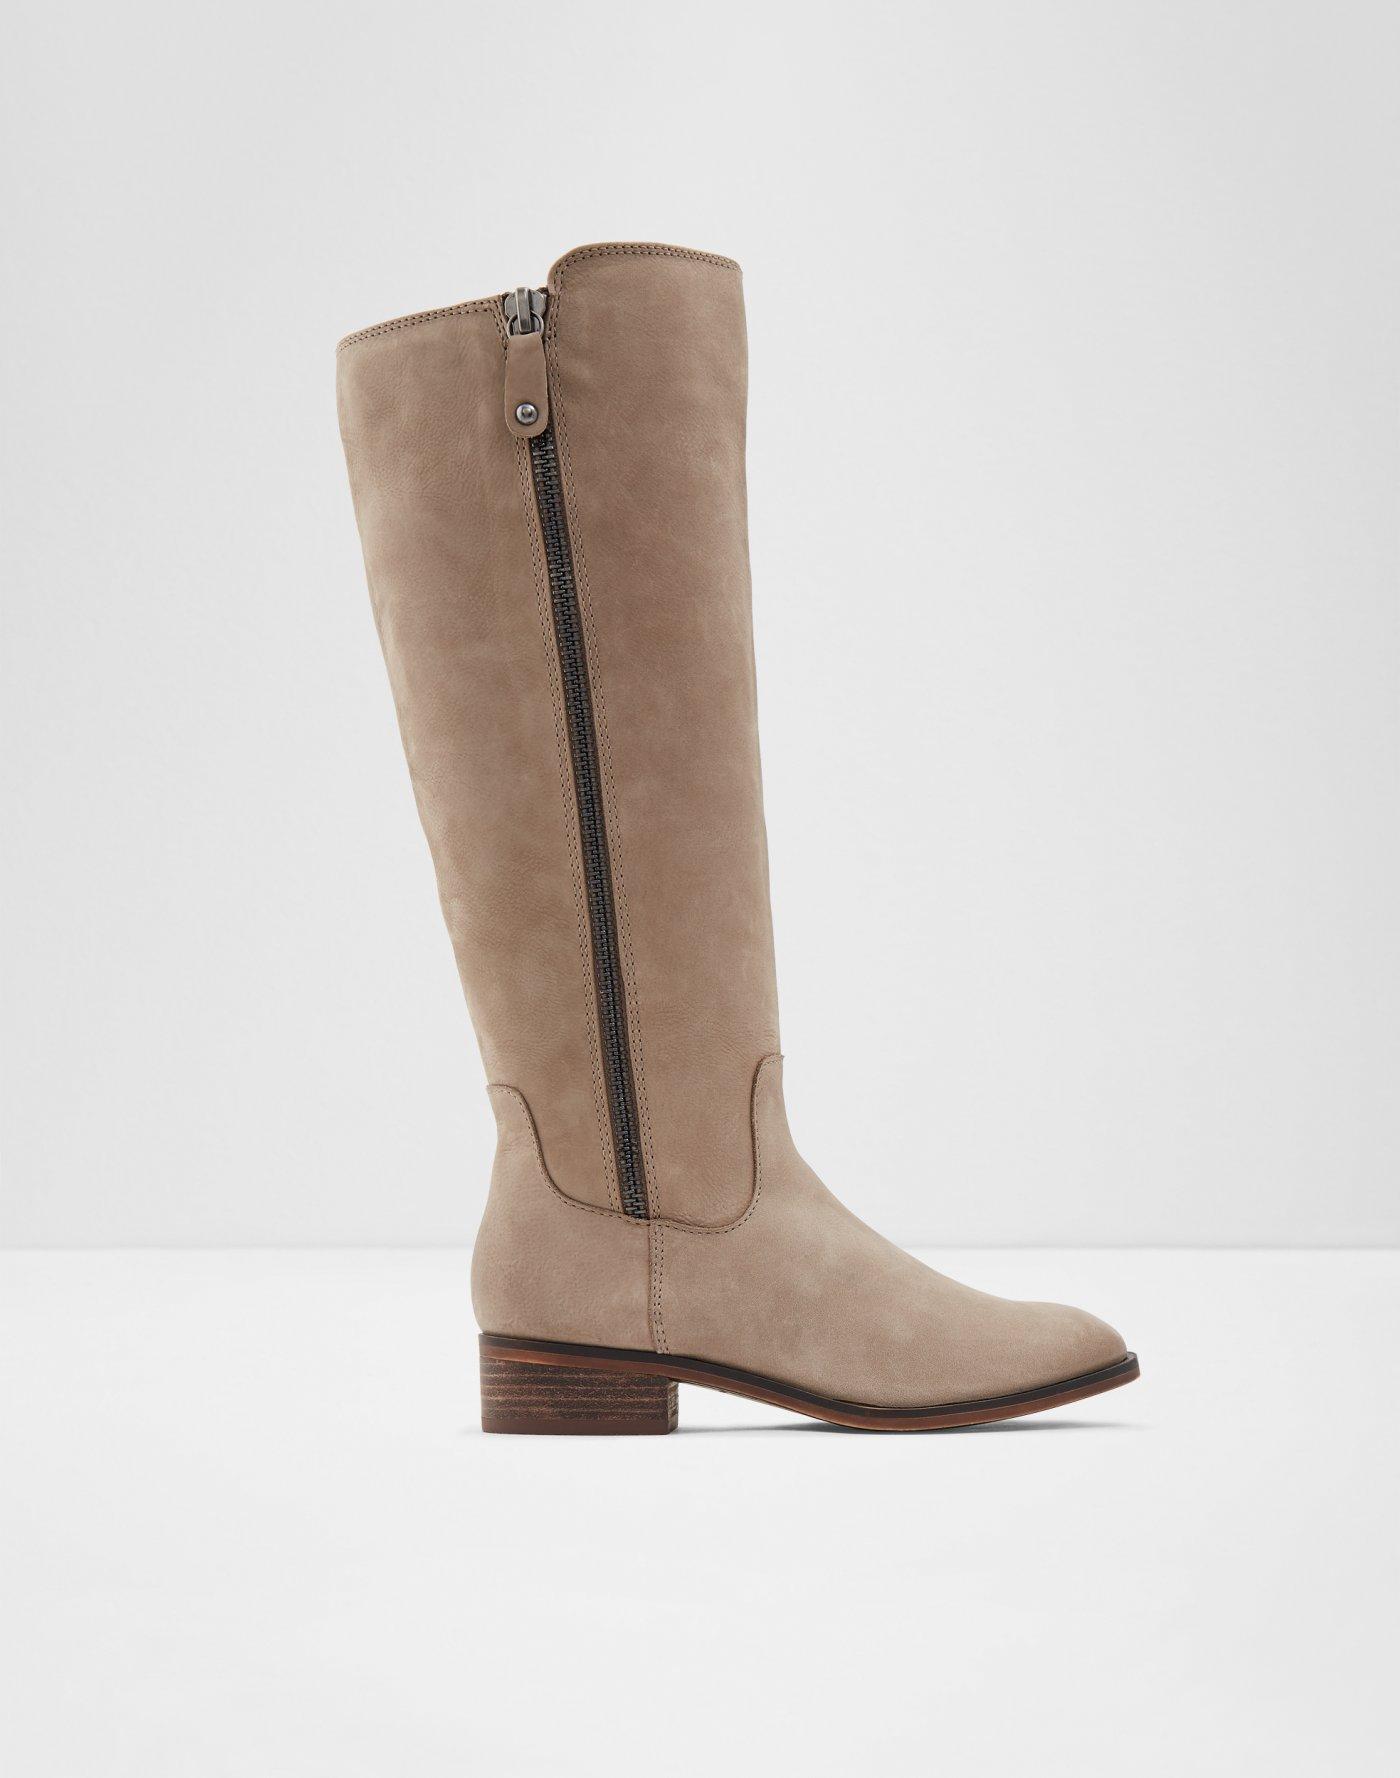 79daf1ba5 Knee-high boots